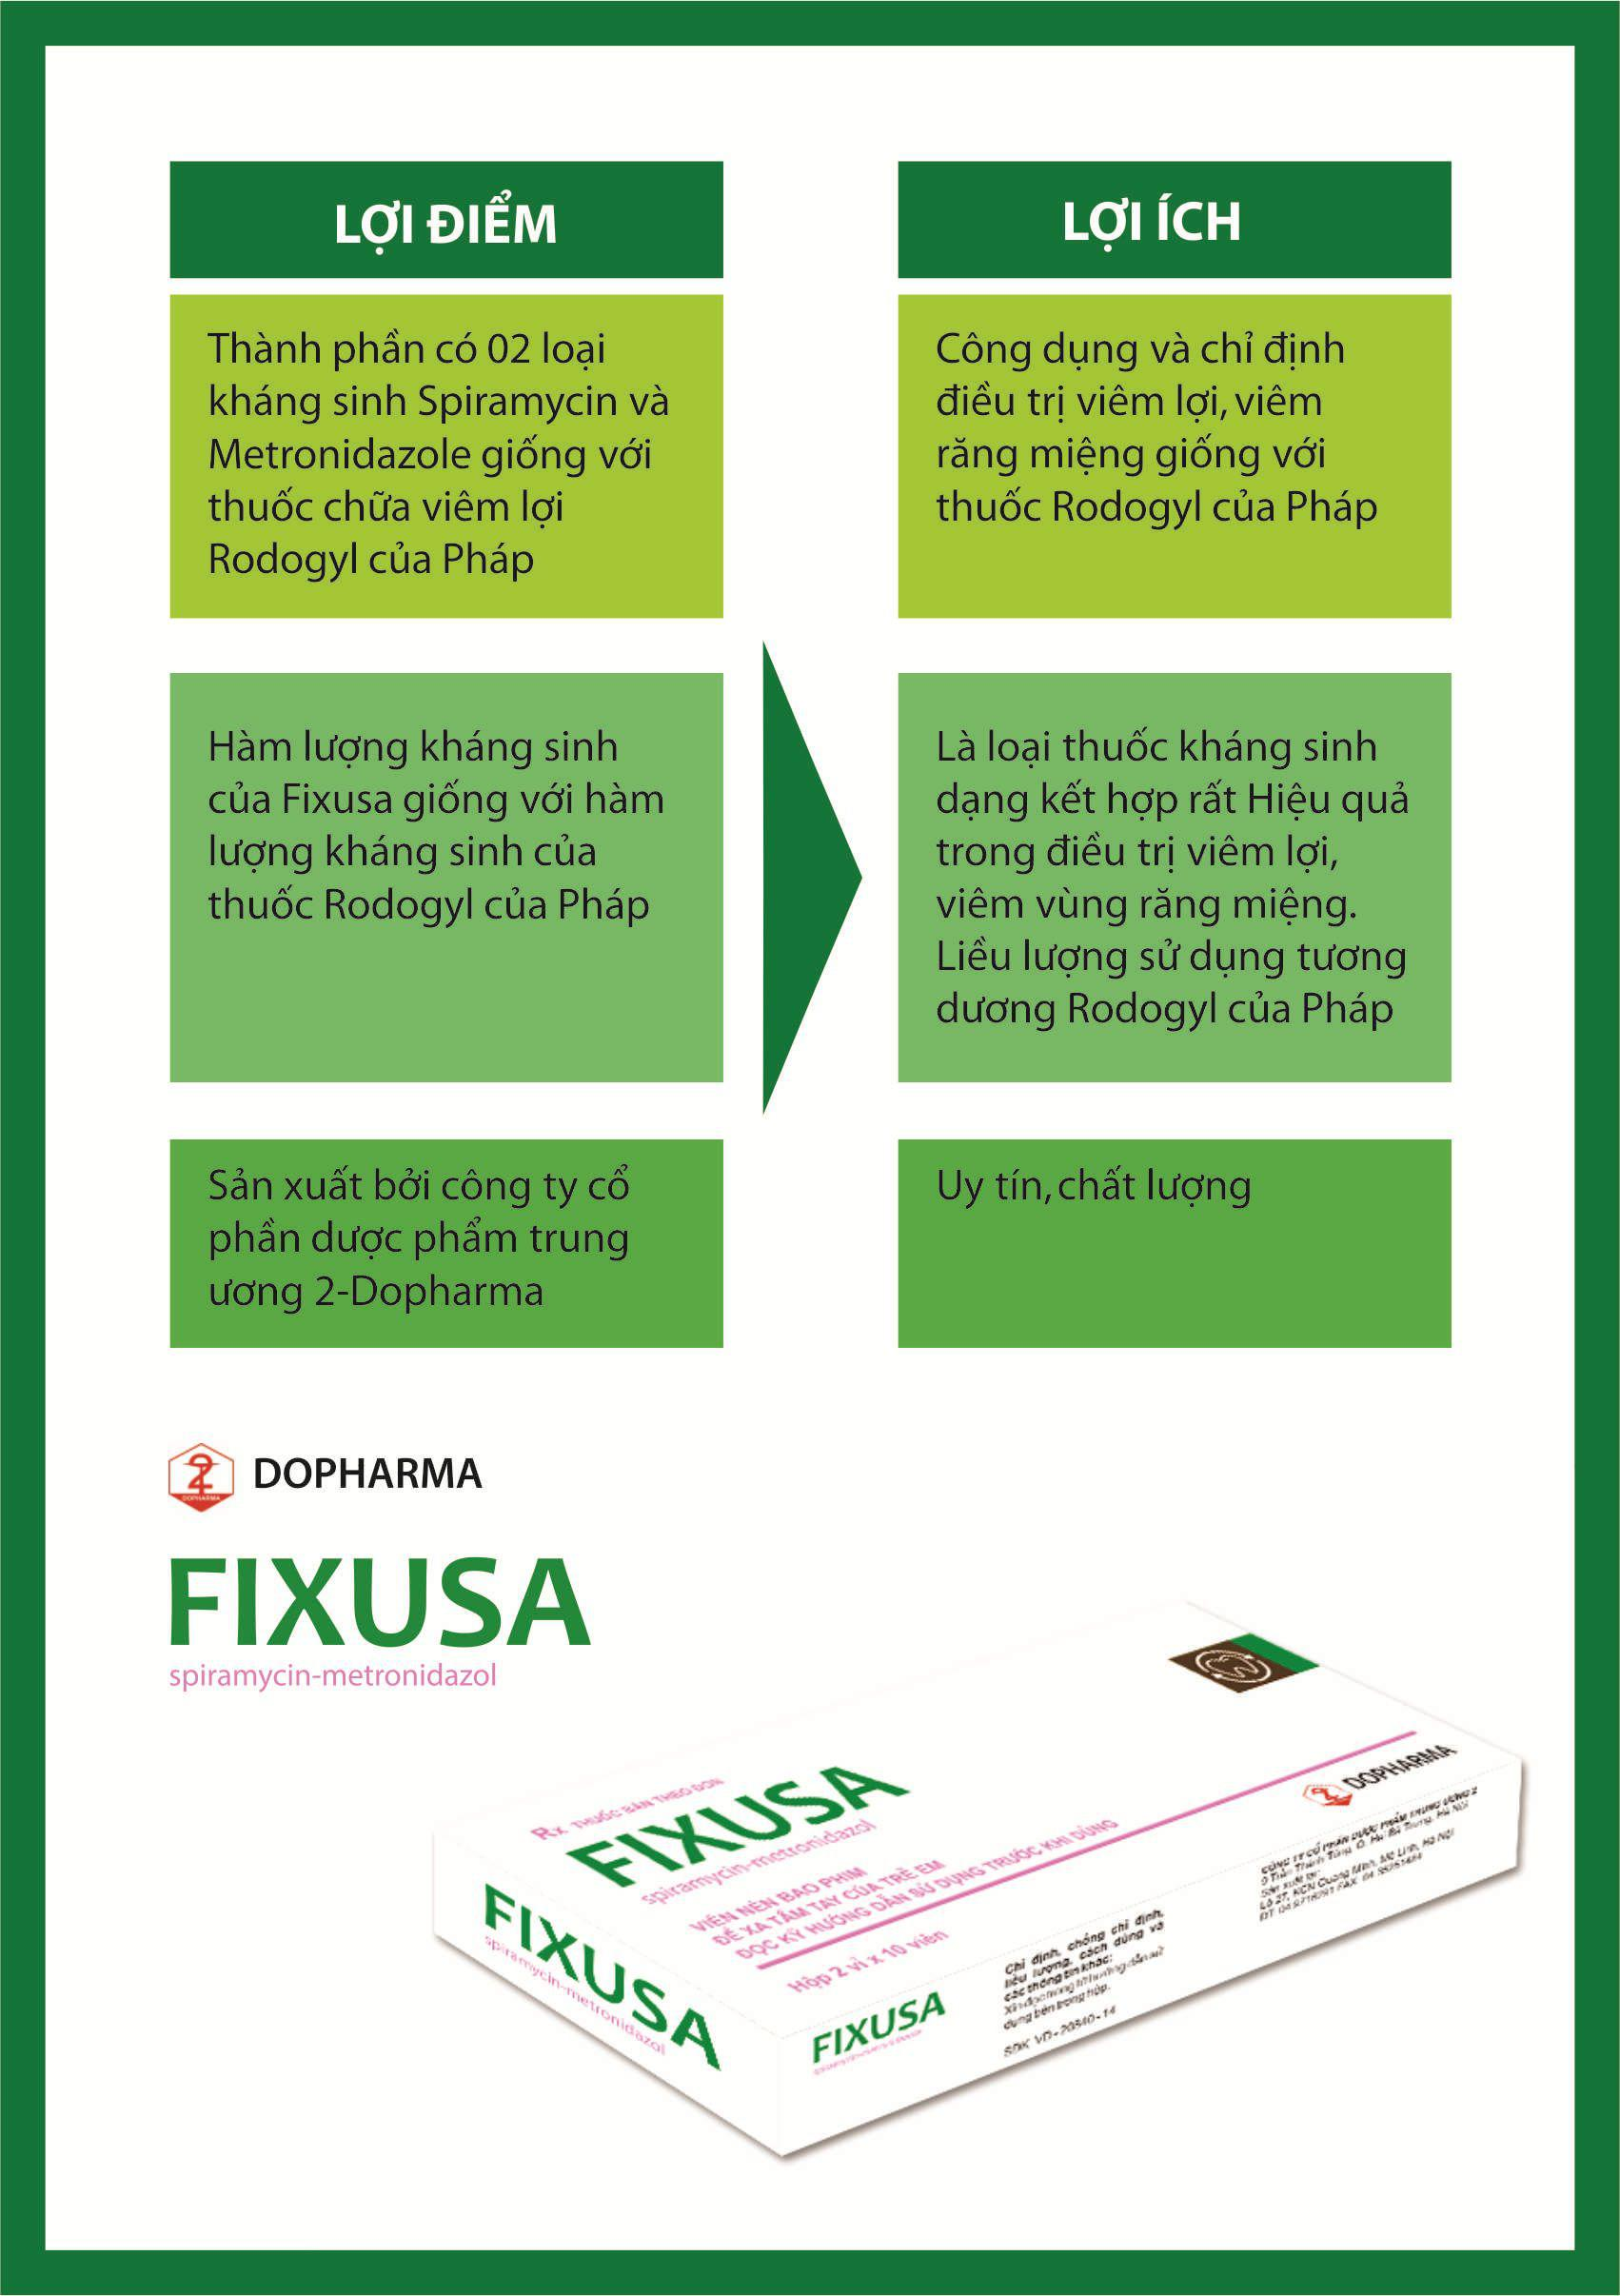 FIXUSA_compressed.jpg